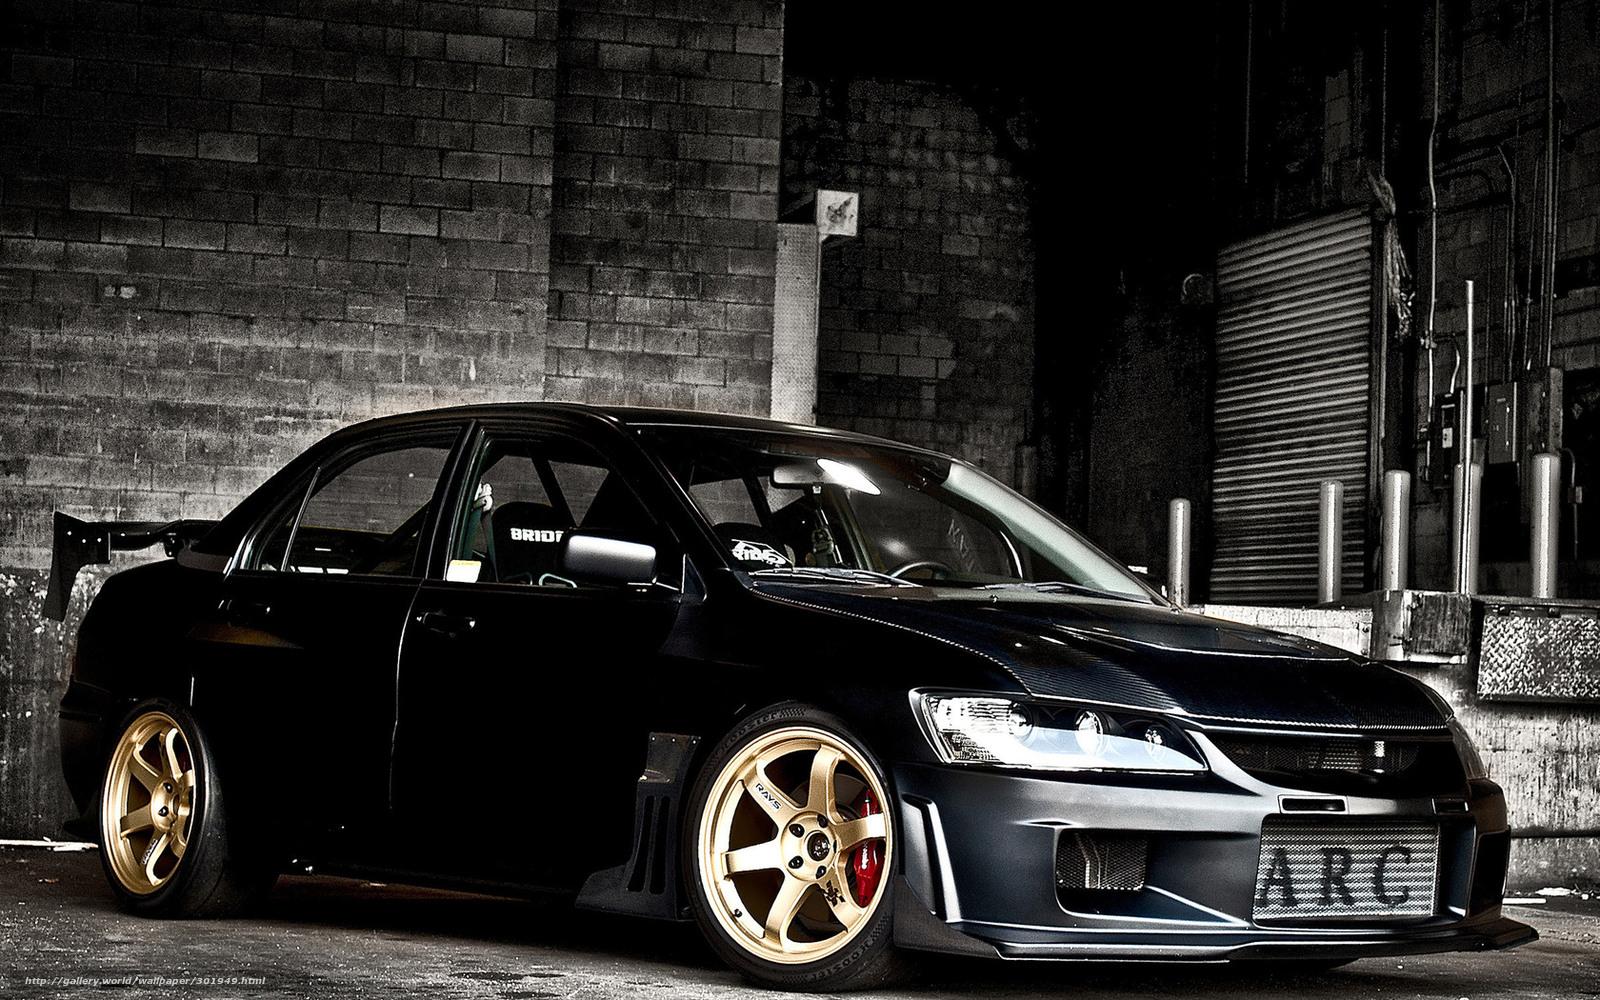 Mitsubishi Lancer Evolution ix, ������ Lancer Evolution, ����, �����